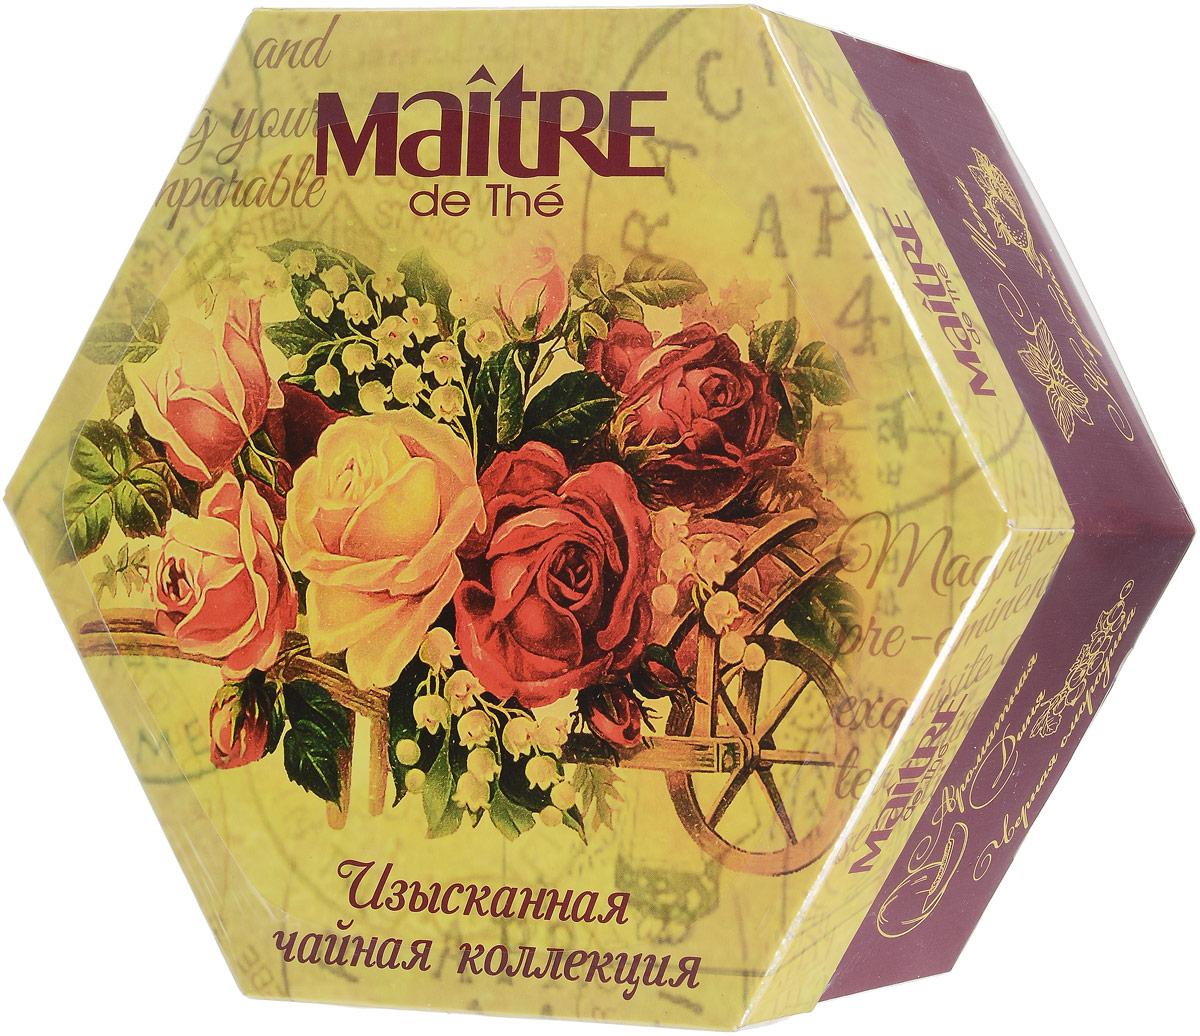 Maitre Розы Изысканная чайная коллекция набор чая в пакетиках, 60 шт maitre best of black черный чай в пакетиках 20 шт